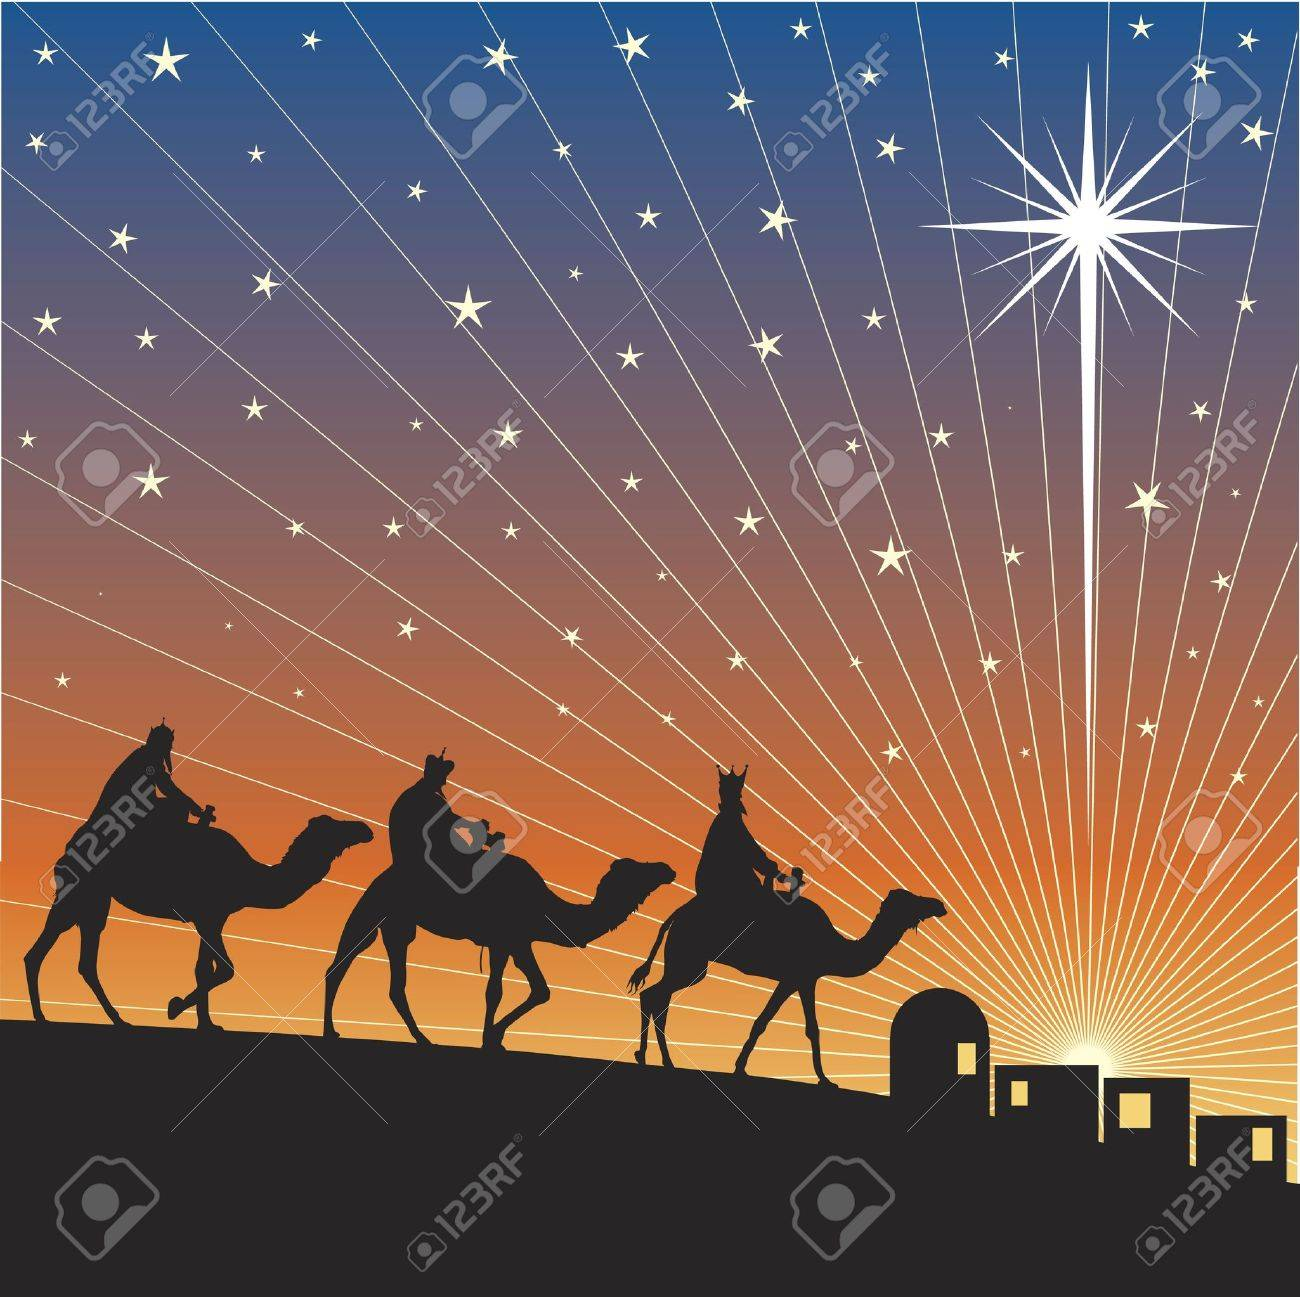 Classic three magic scene and shining star of Bethlehem. Stock Vector - 8045246